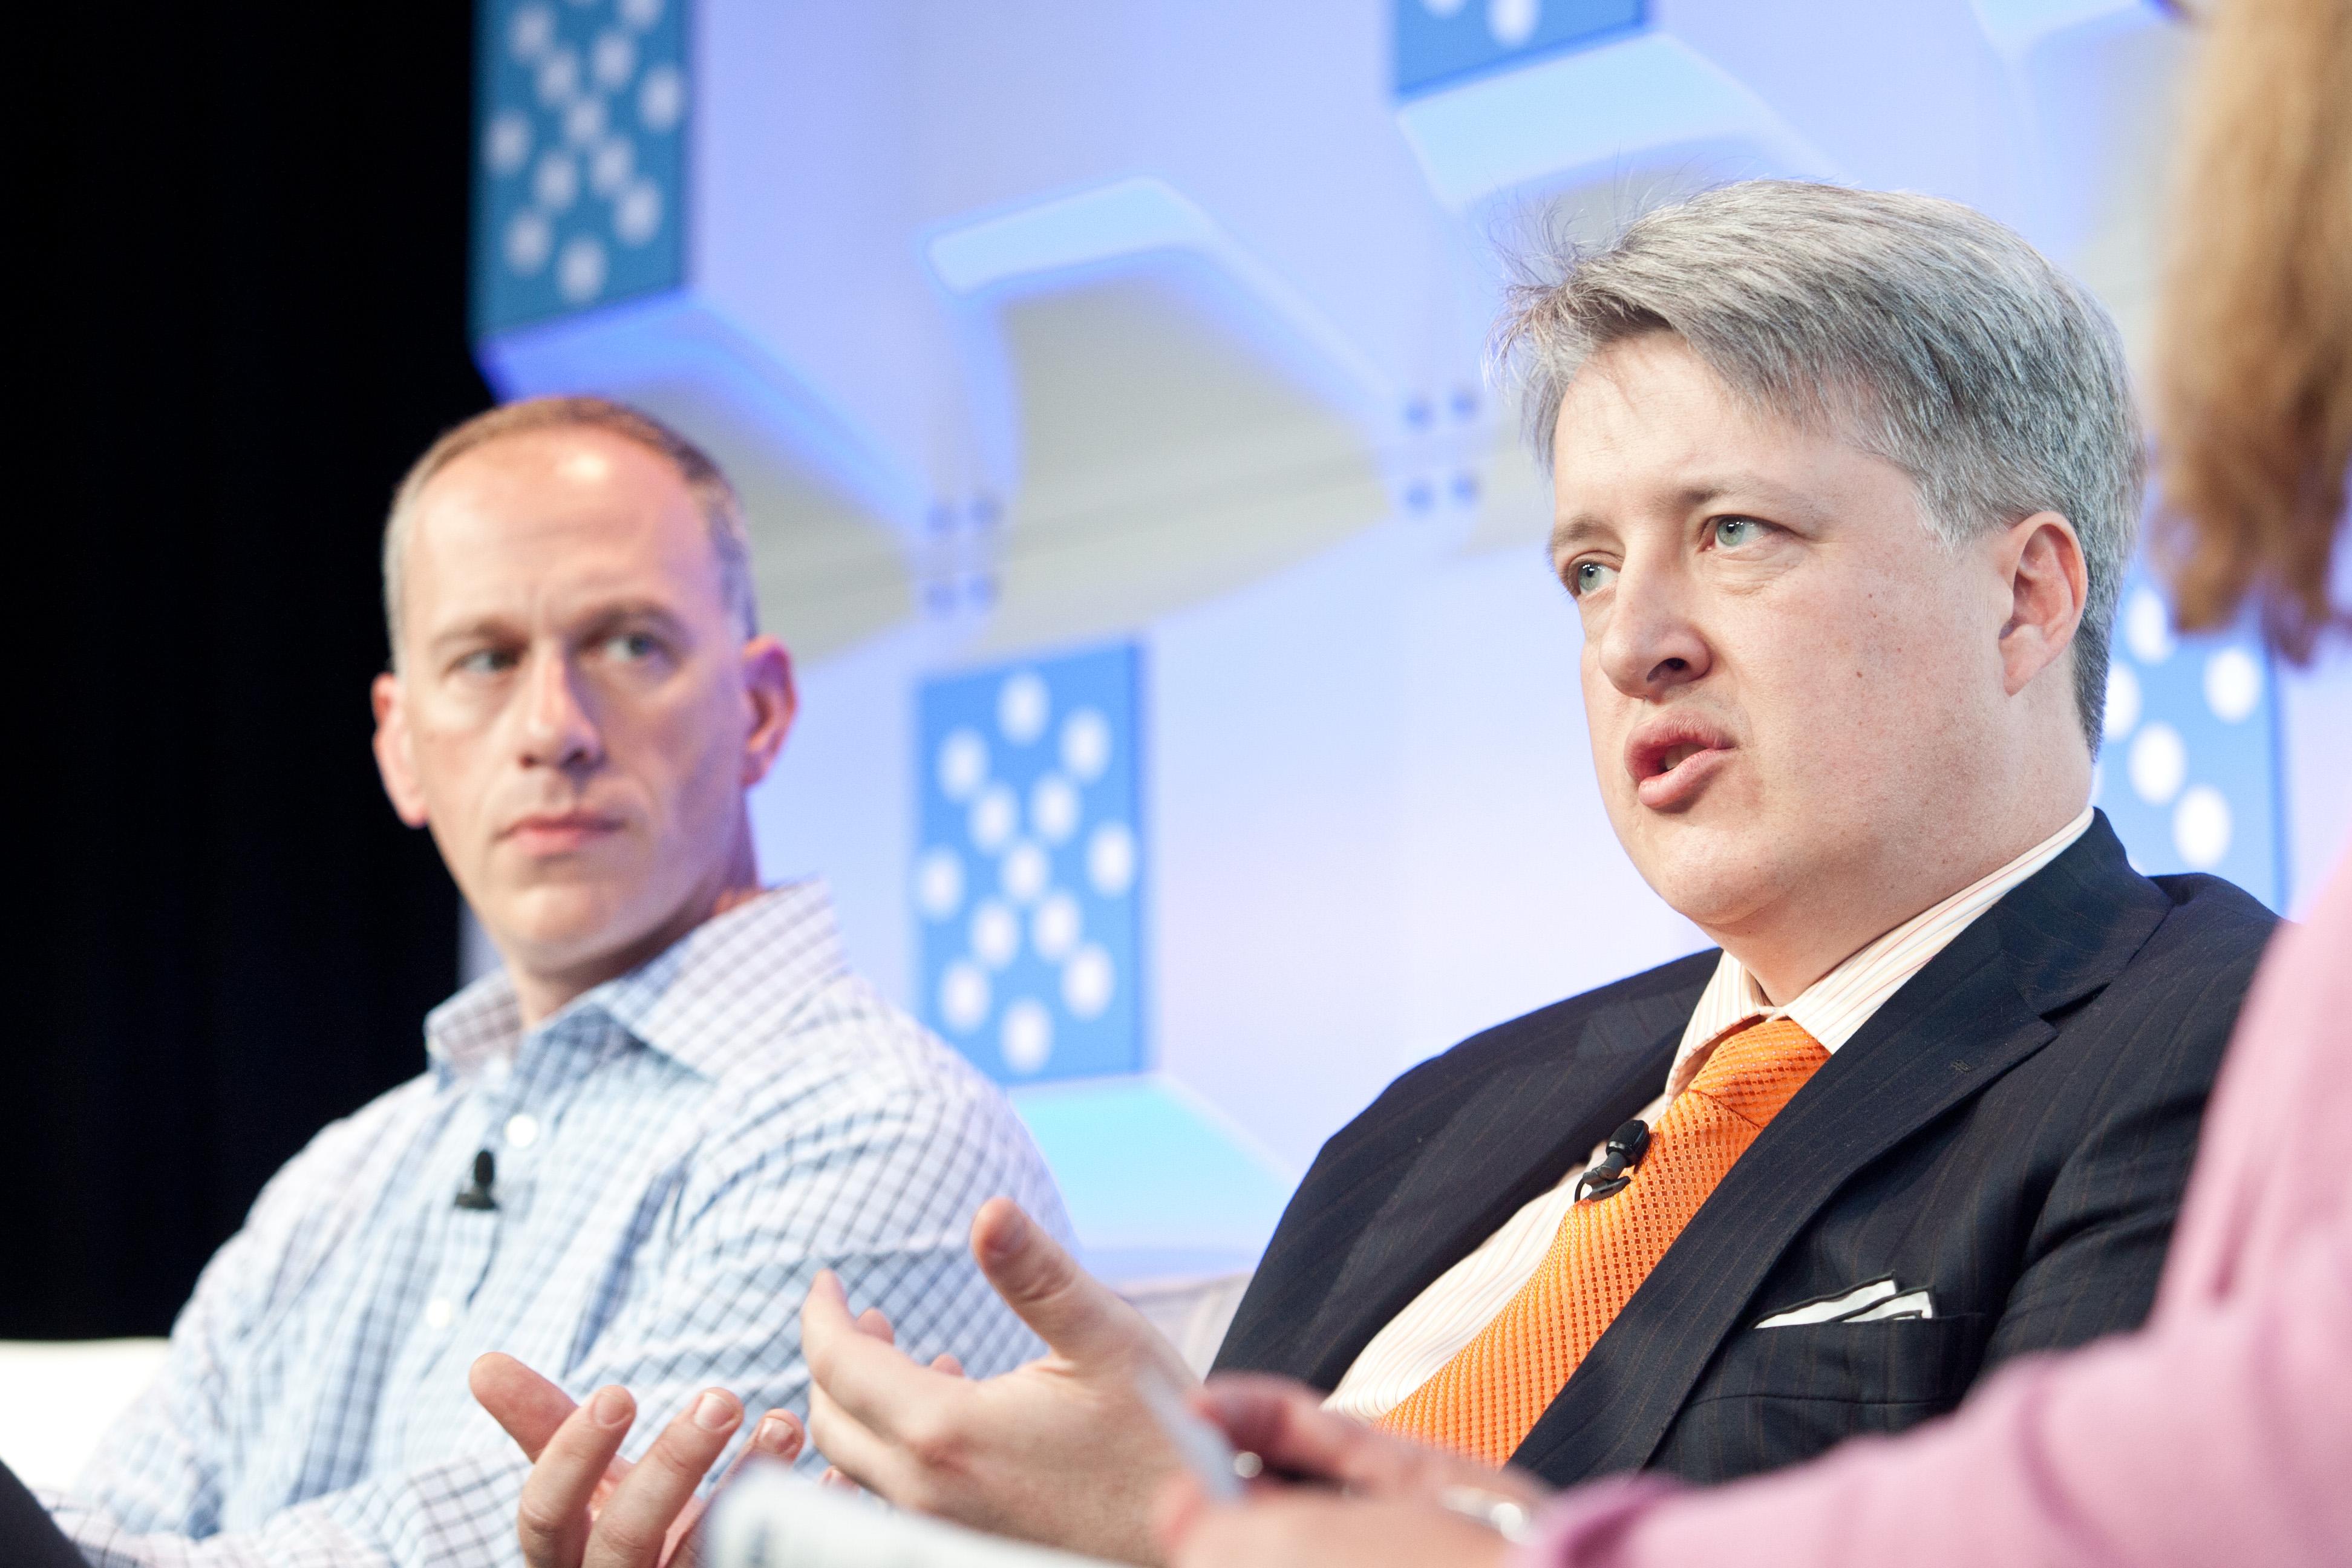 Structure 2012: Jason Hoffman - Founder and CTO, Joyent, Dave Rosenberg - CEO, Nodeable